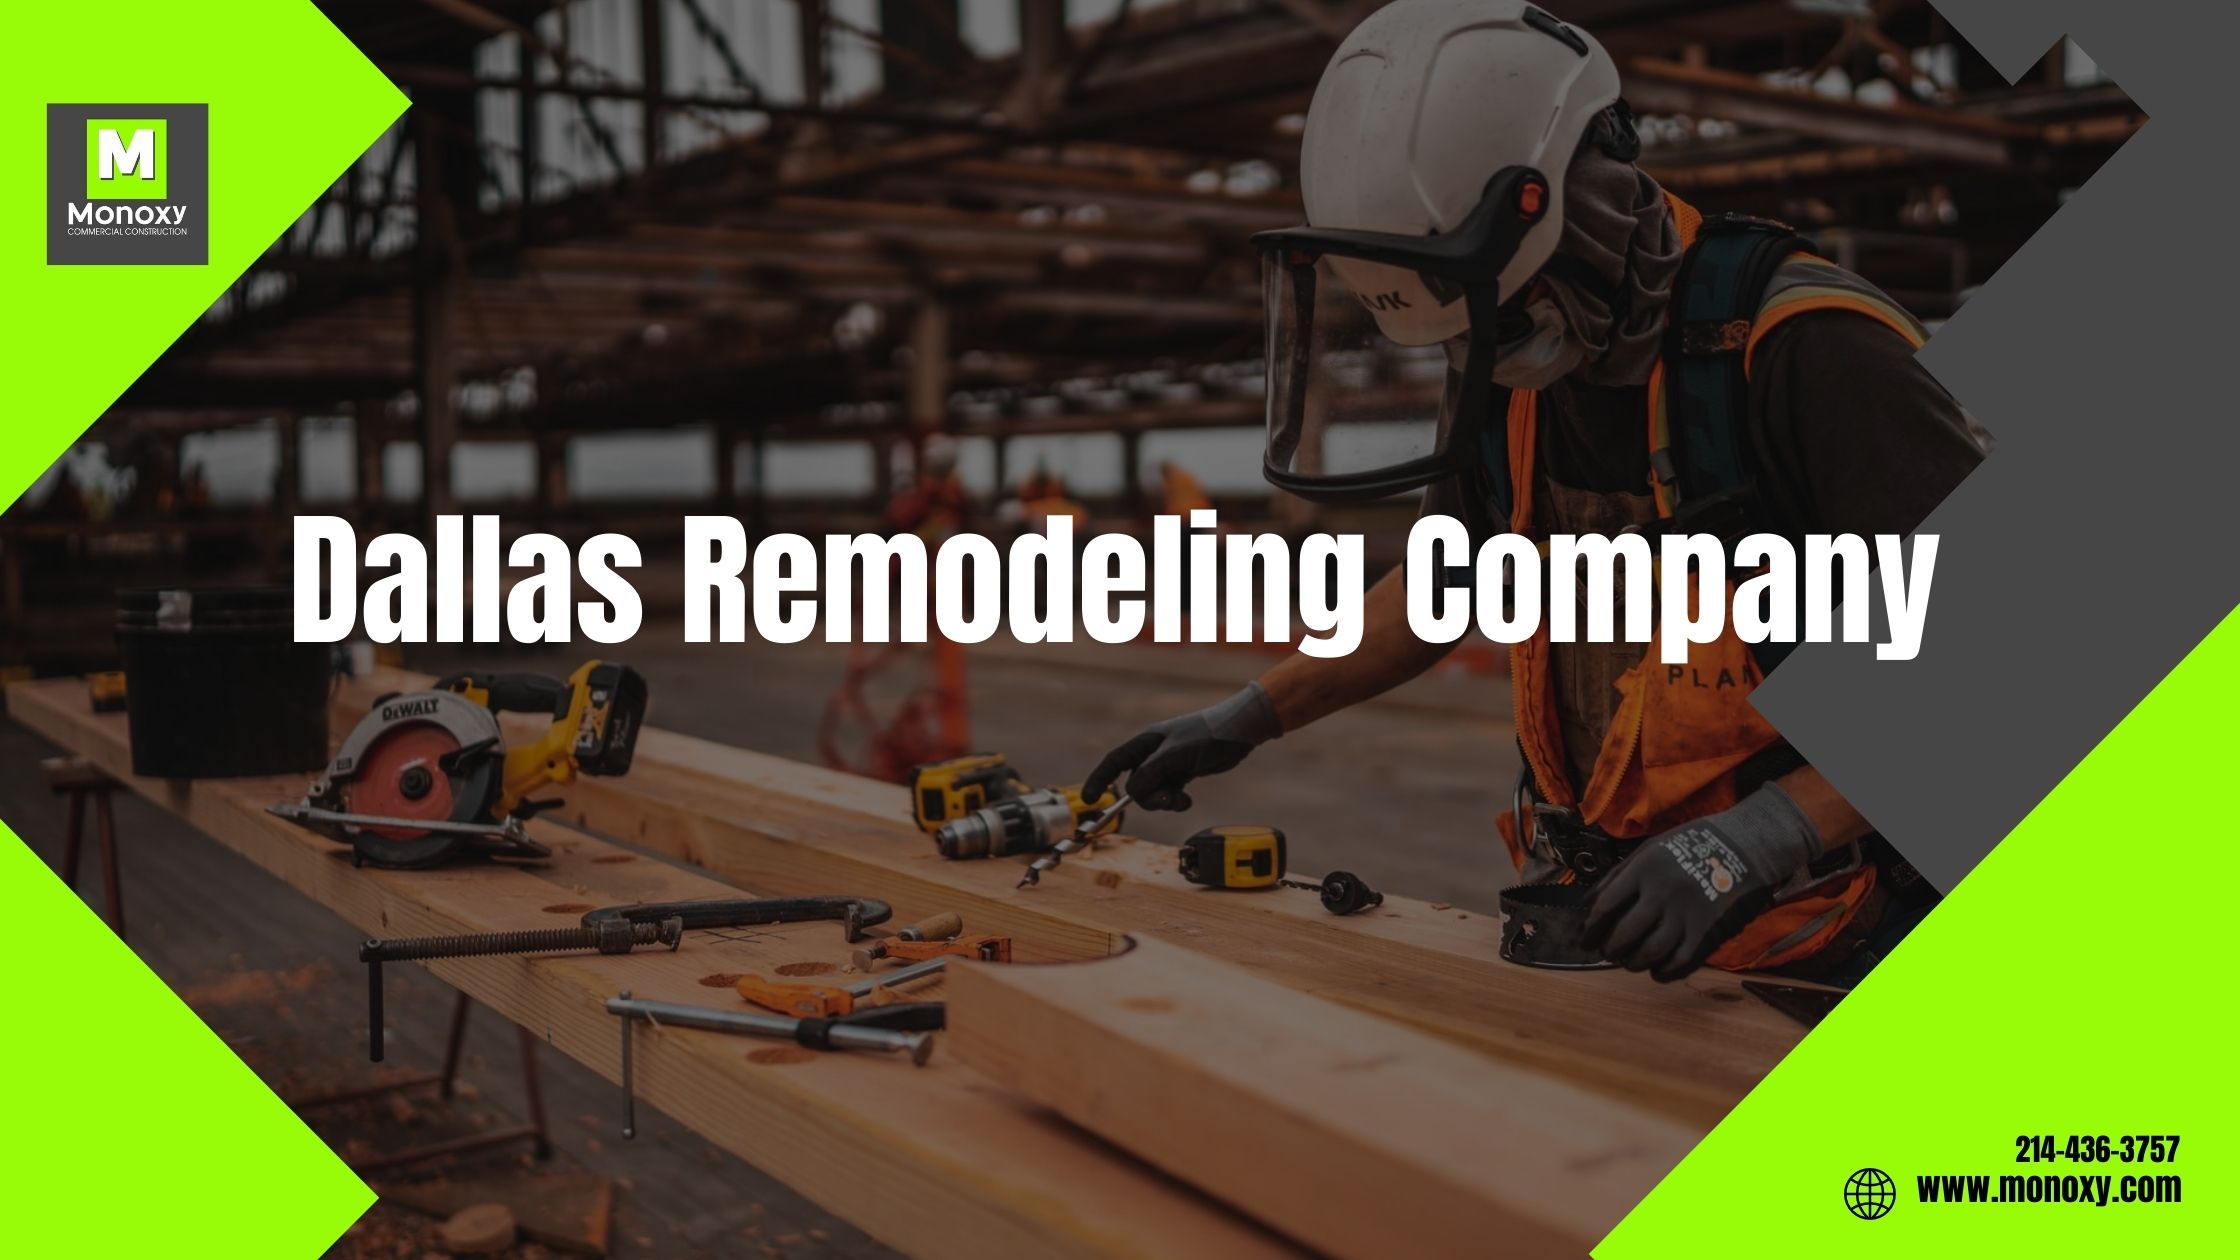 Trustworthy Dallas Remodeling Company